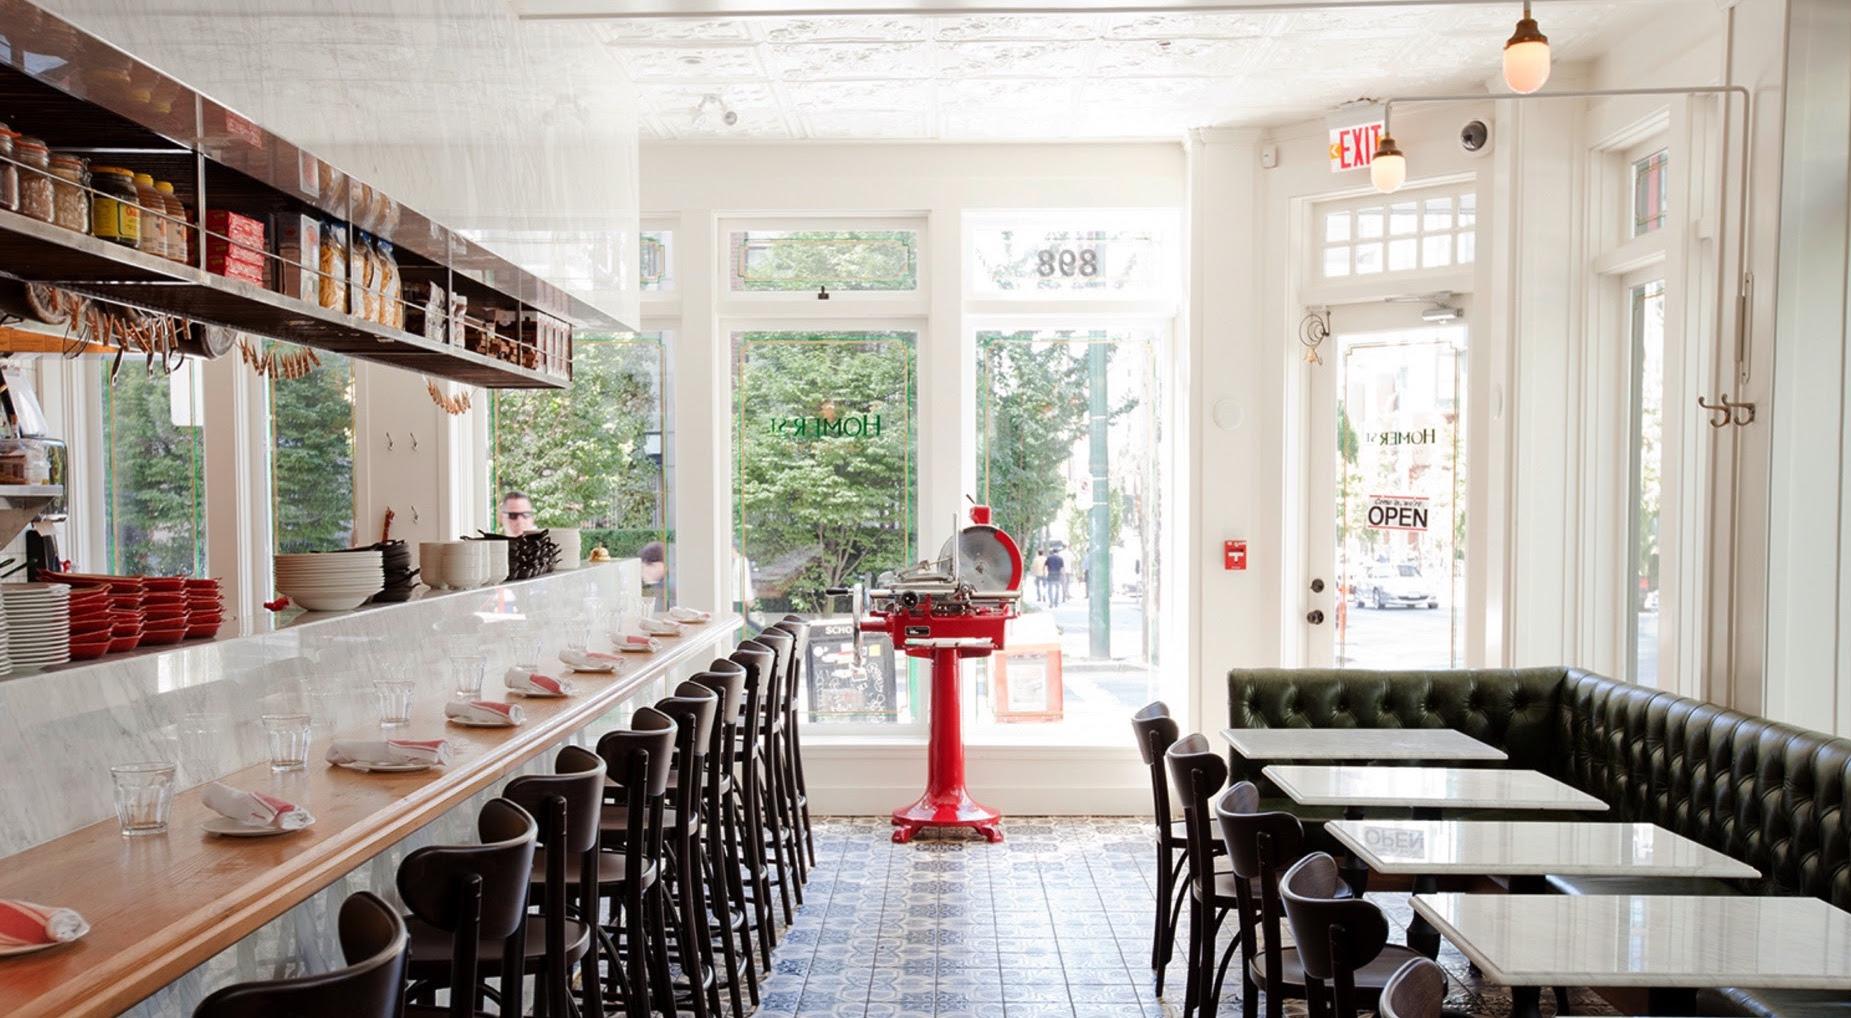 Homer St. Café announces three-course  Dine Out Vancouver Menu